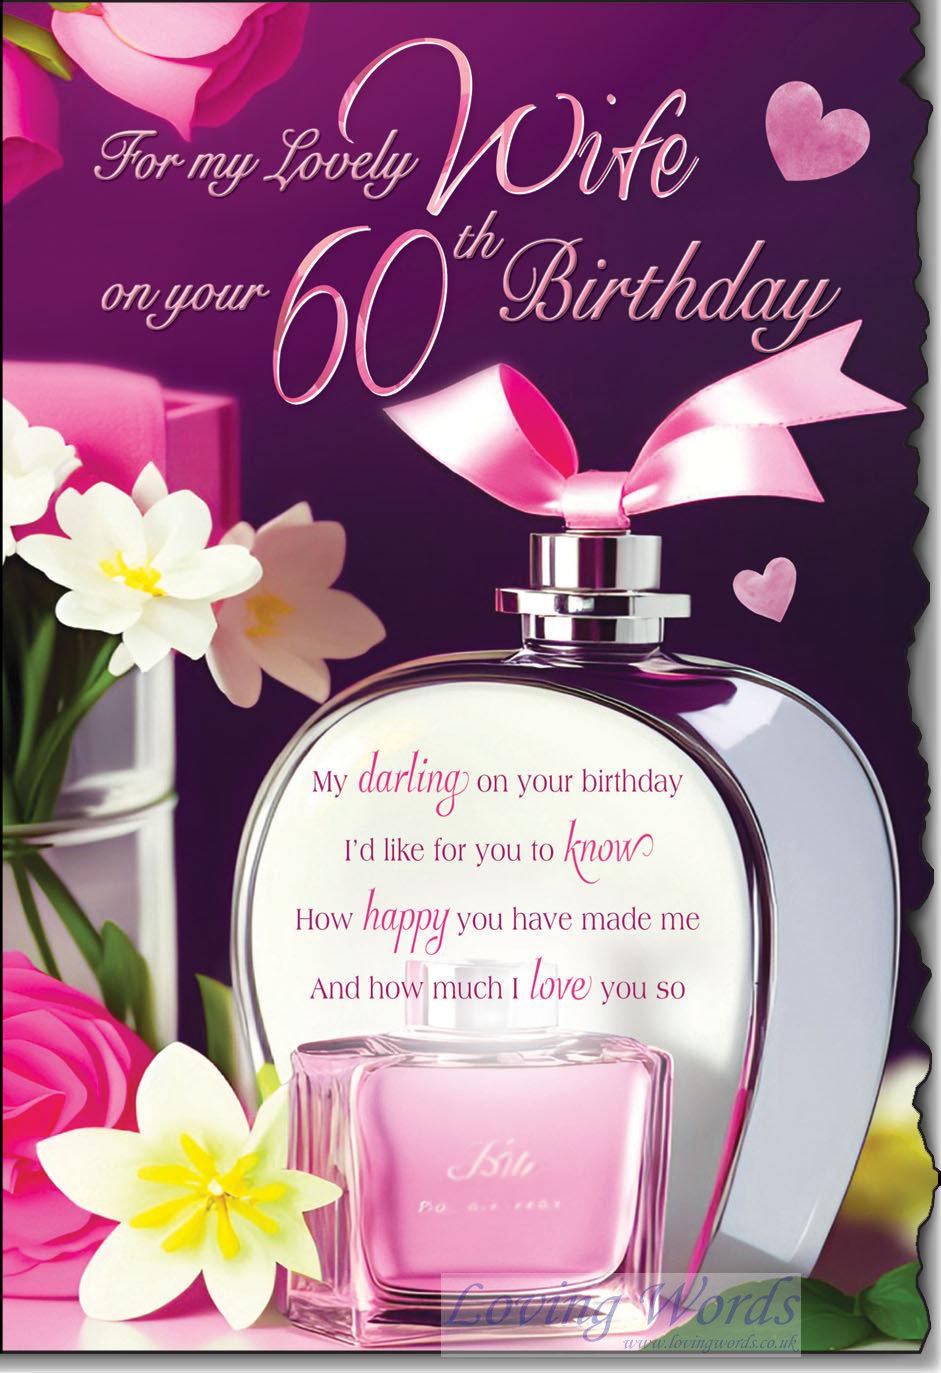 wife 60th birthday  greeting cardsloving words